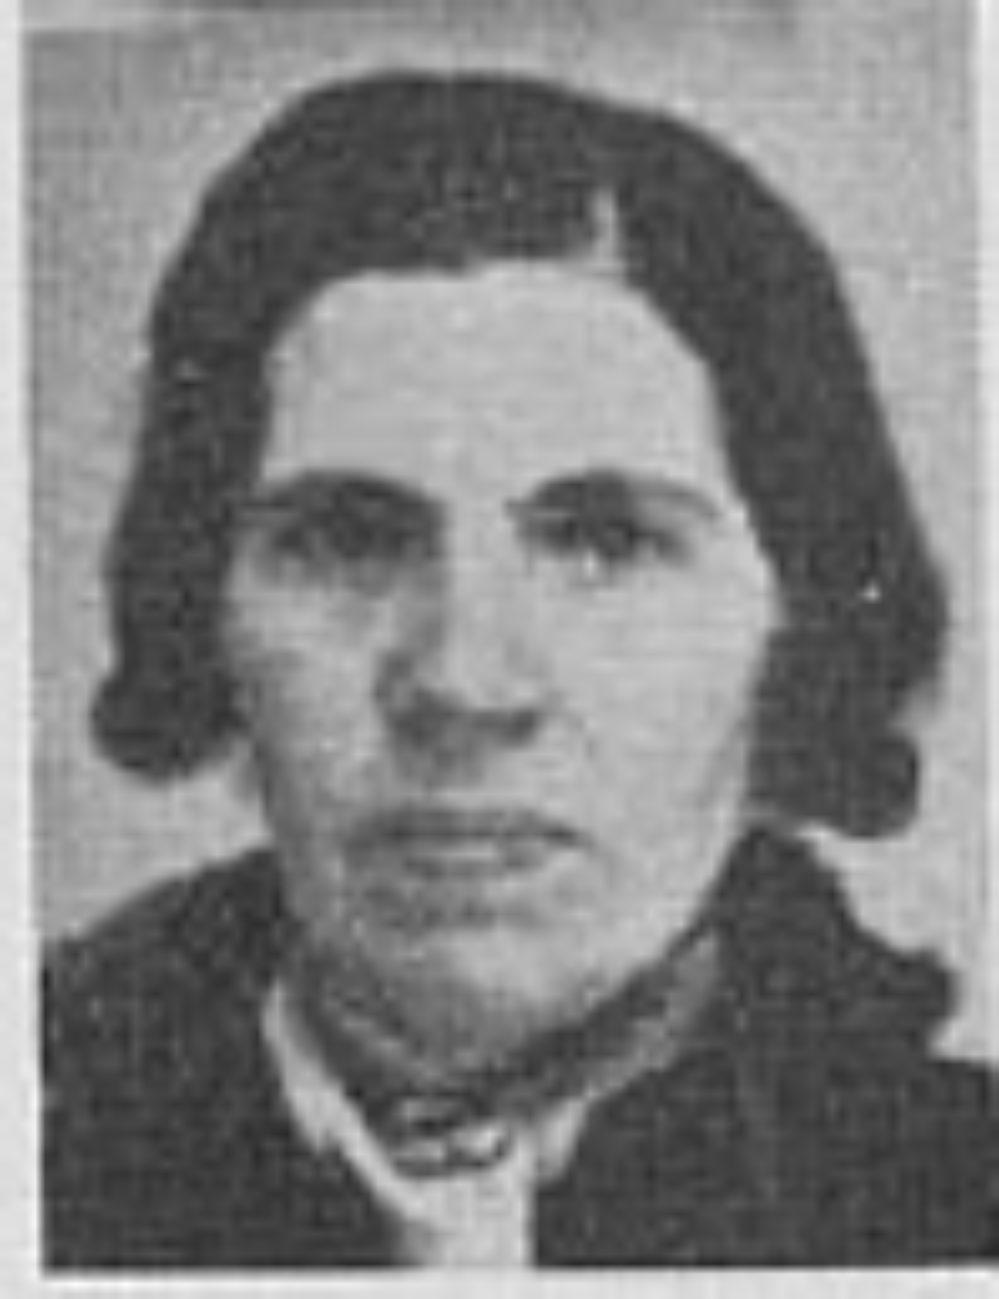 Andrea Bertine Sundbotten